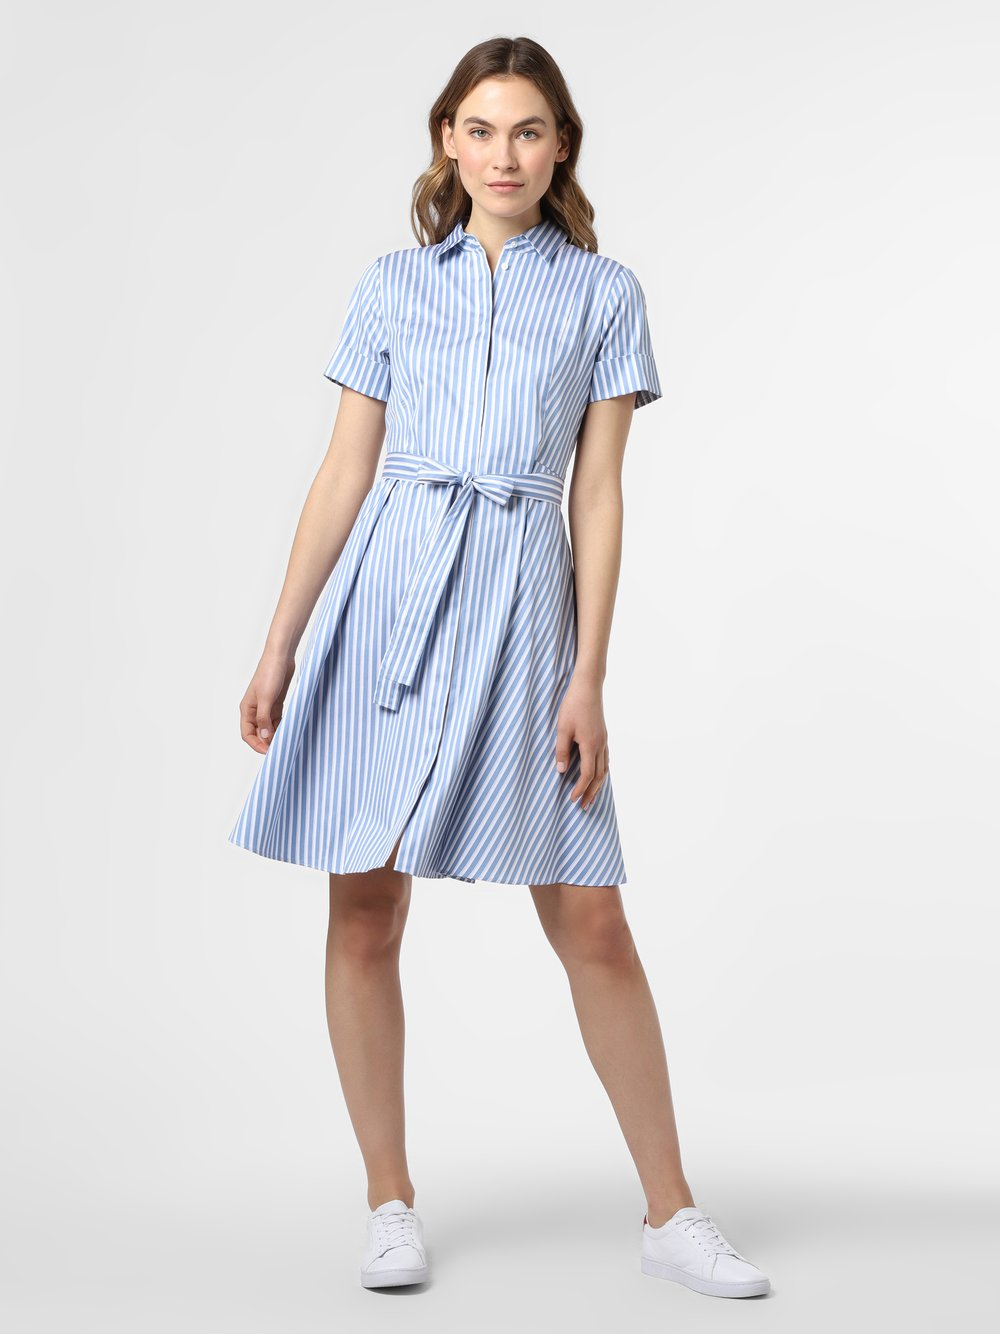 HUGO - Sukienka damska – Ekaliana, niebieski